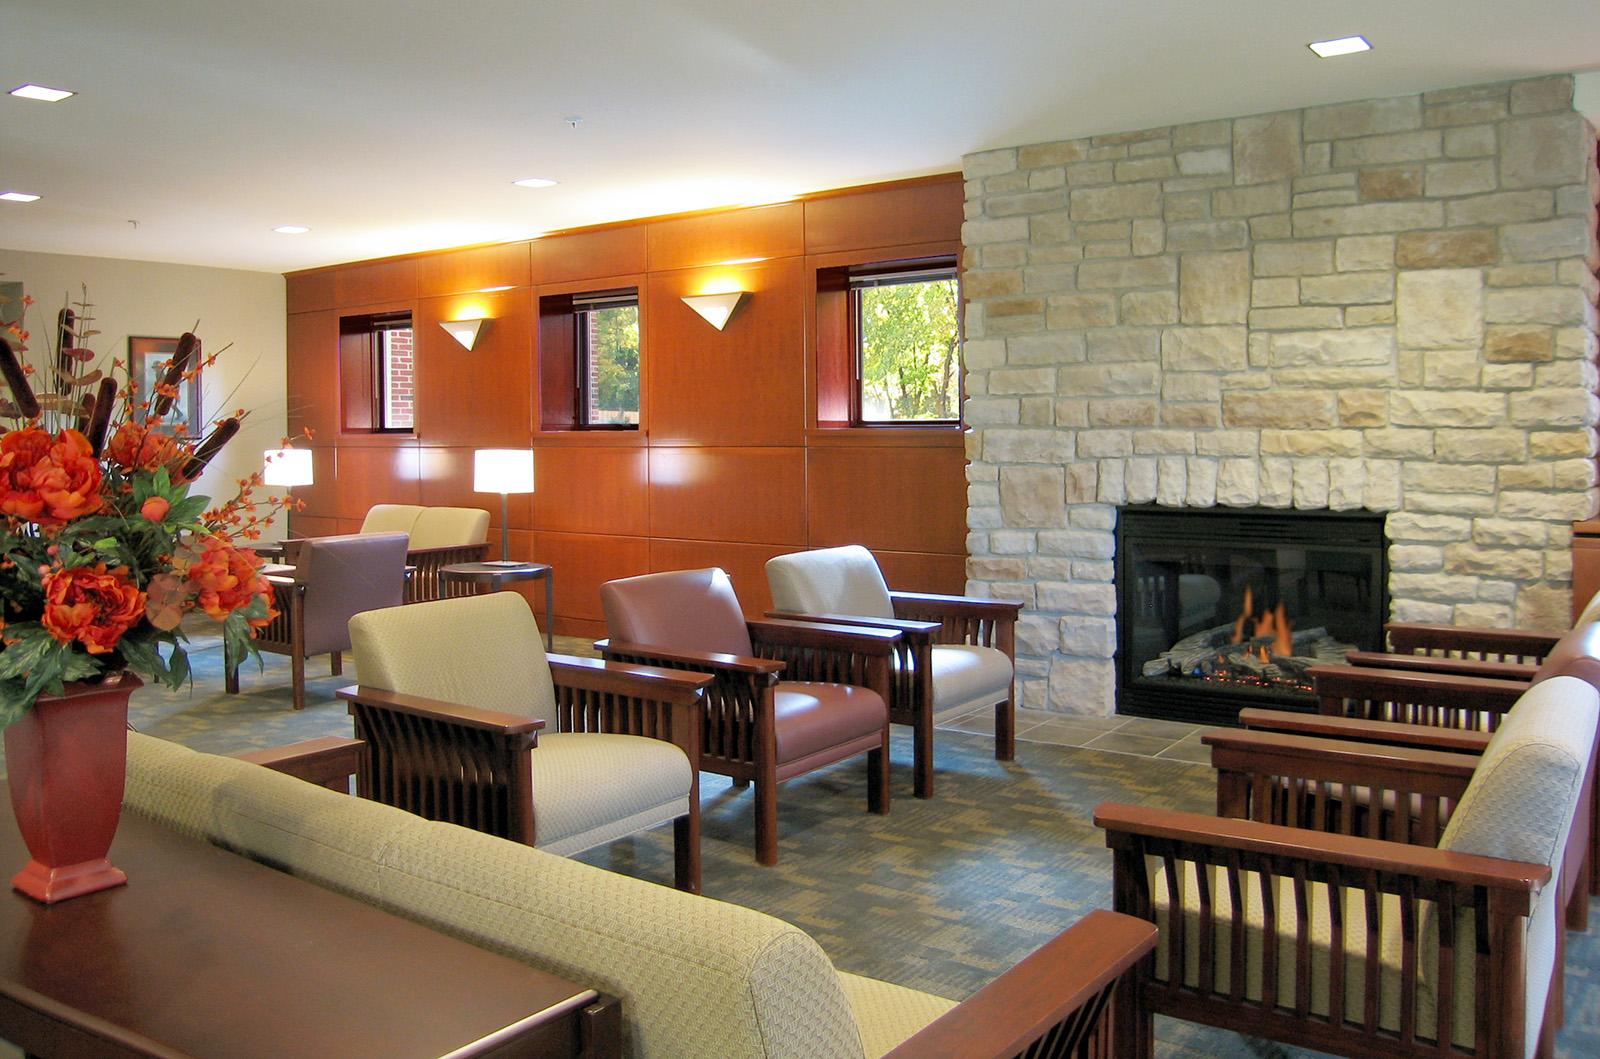 university-of-michigan-evans-scholars-lounge